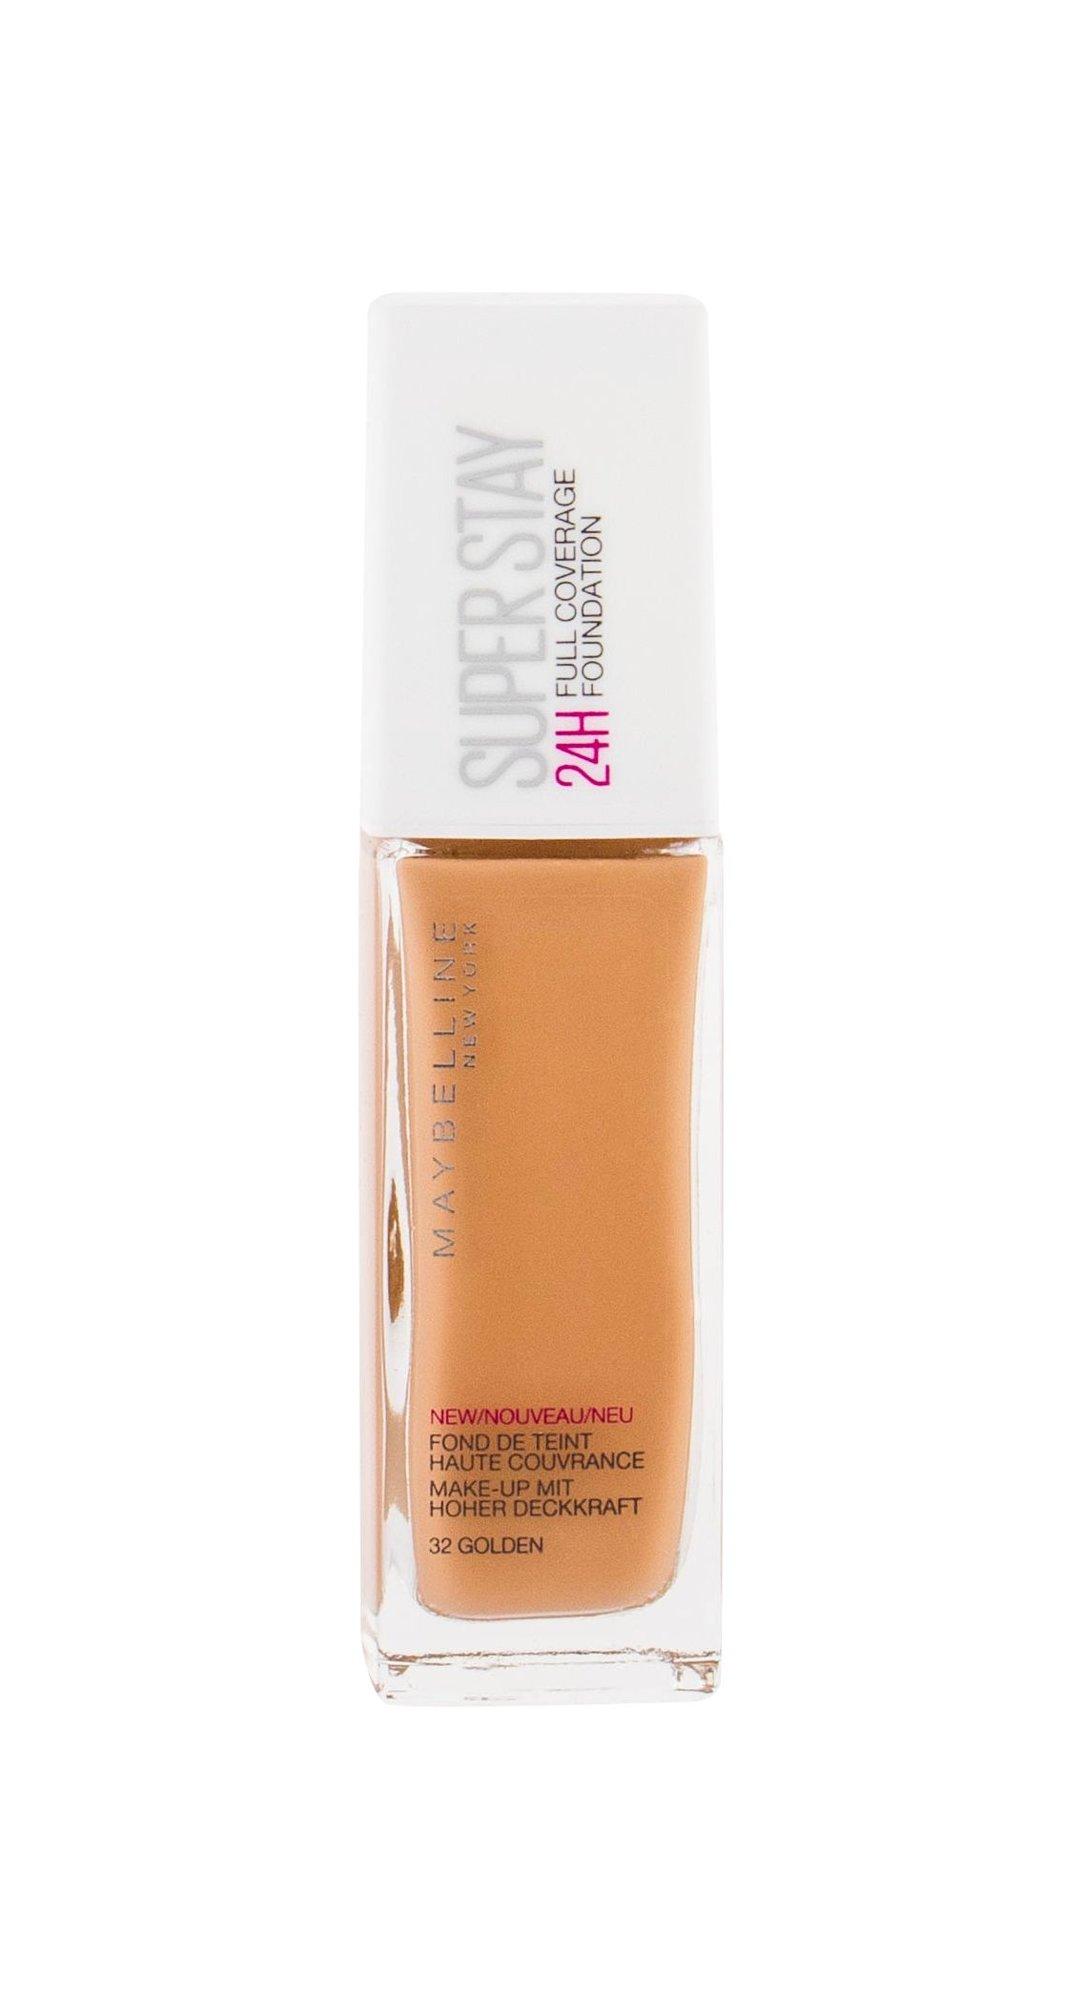 Maybelline Superstay Makeup 30ml 32 Golden